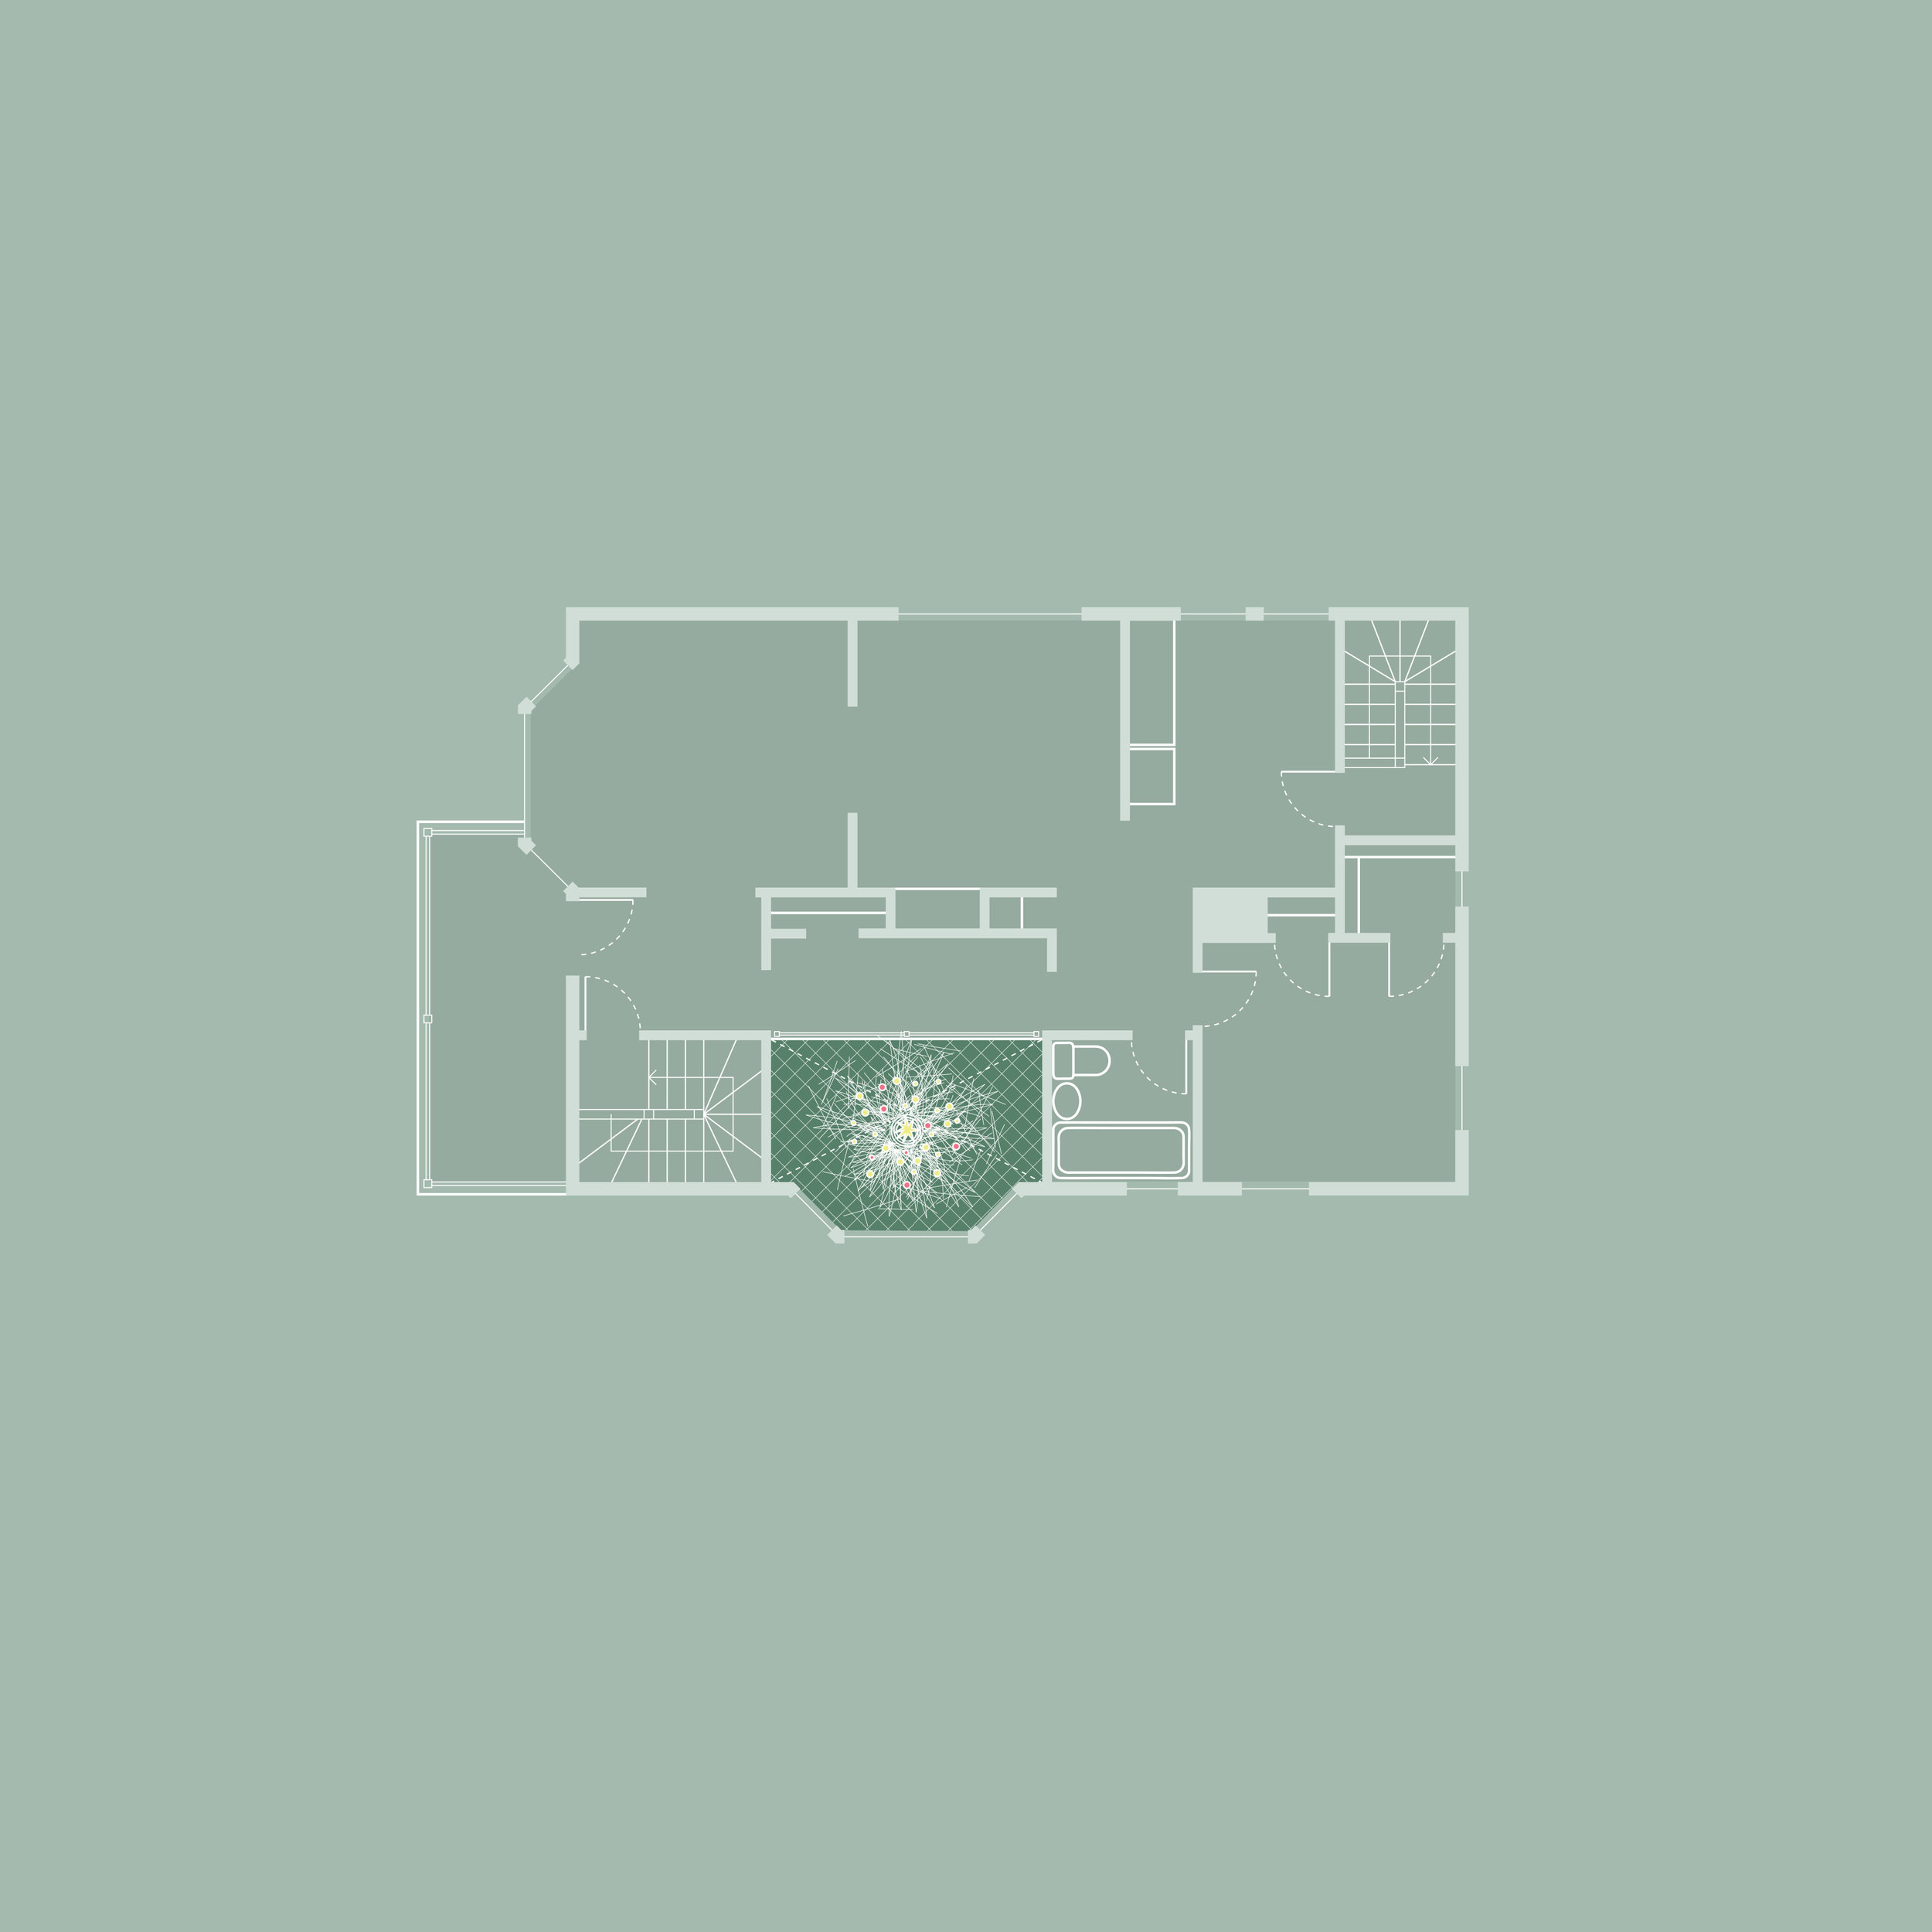 TripleDecker_Wormhole_Plans-4.jpg